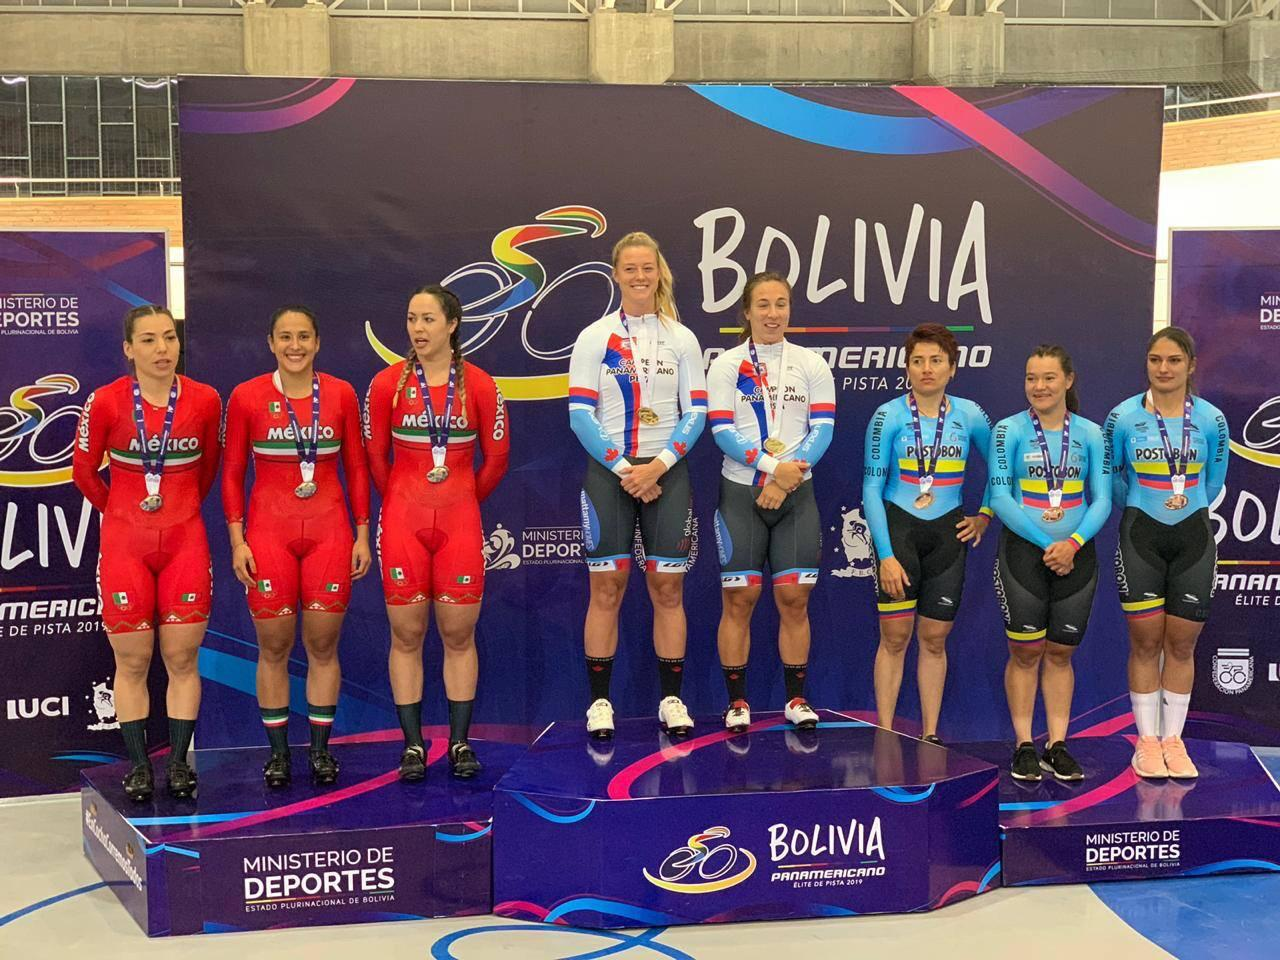 Tercer lugar para México en Panamericano de Ciclismo de Pista en Bolivia